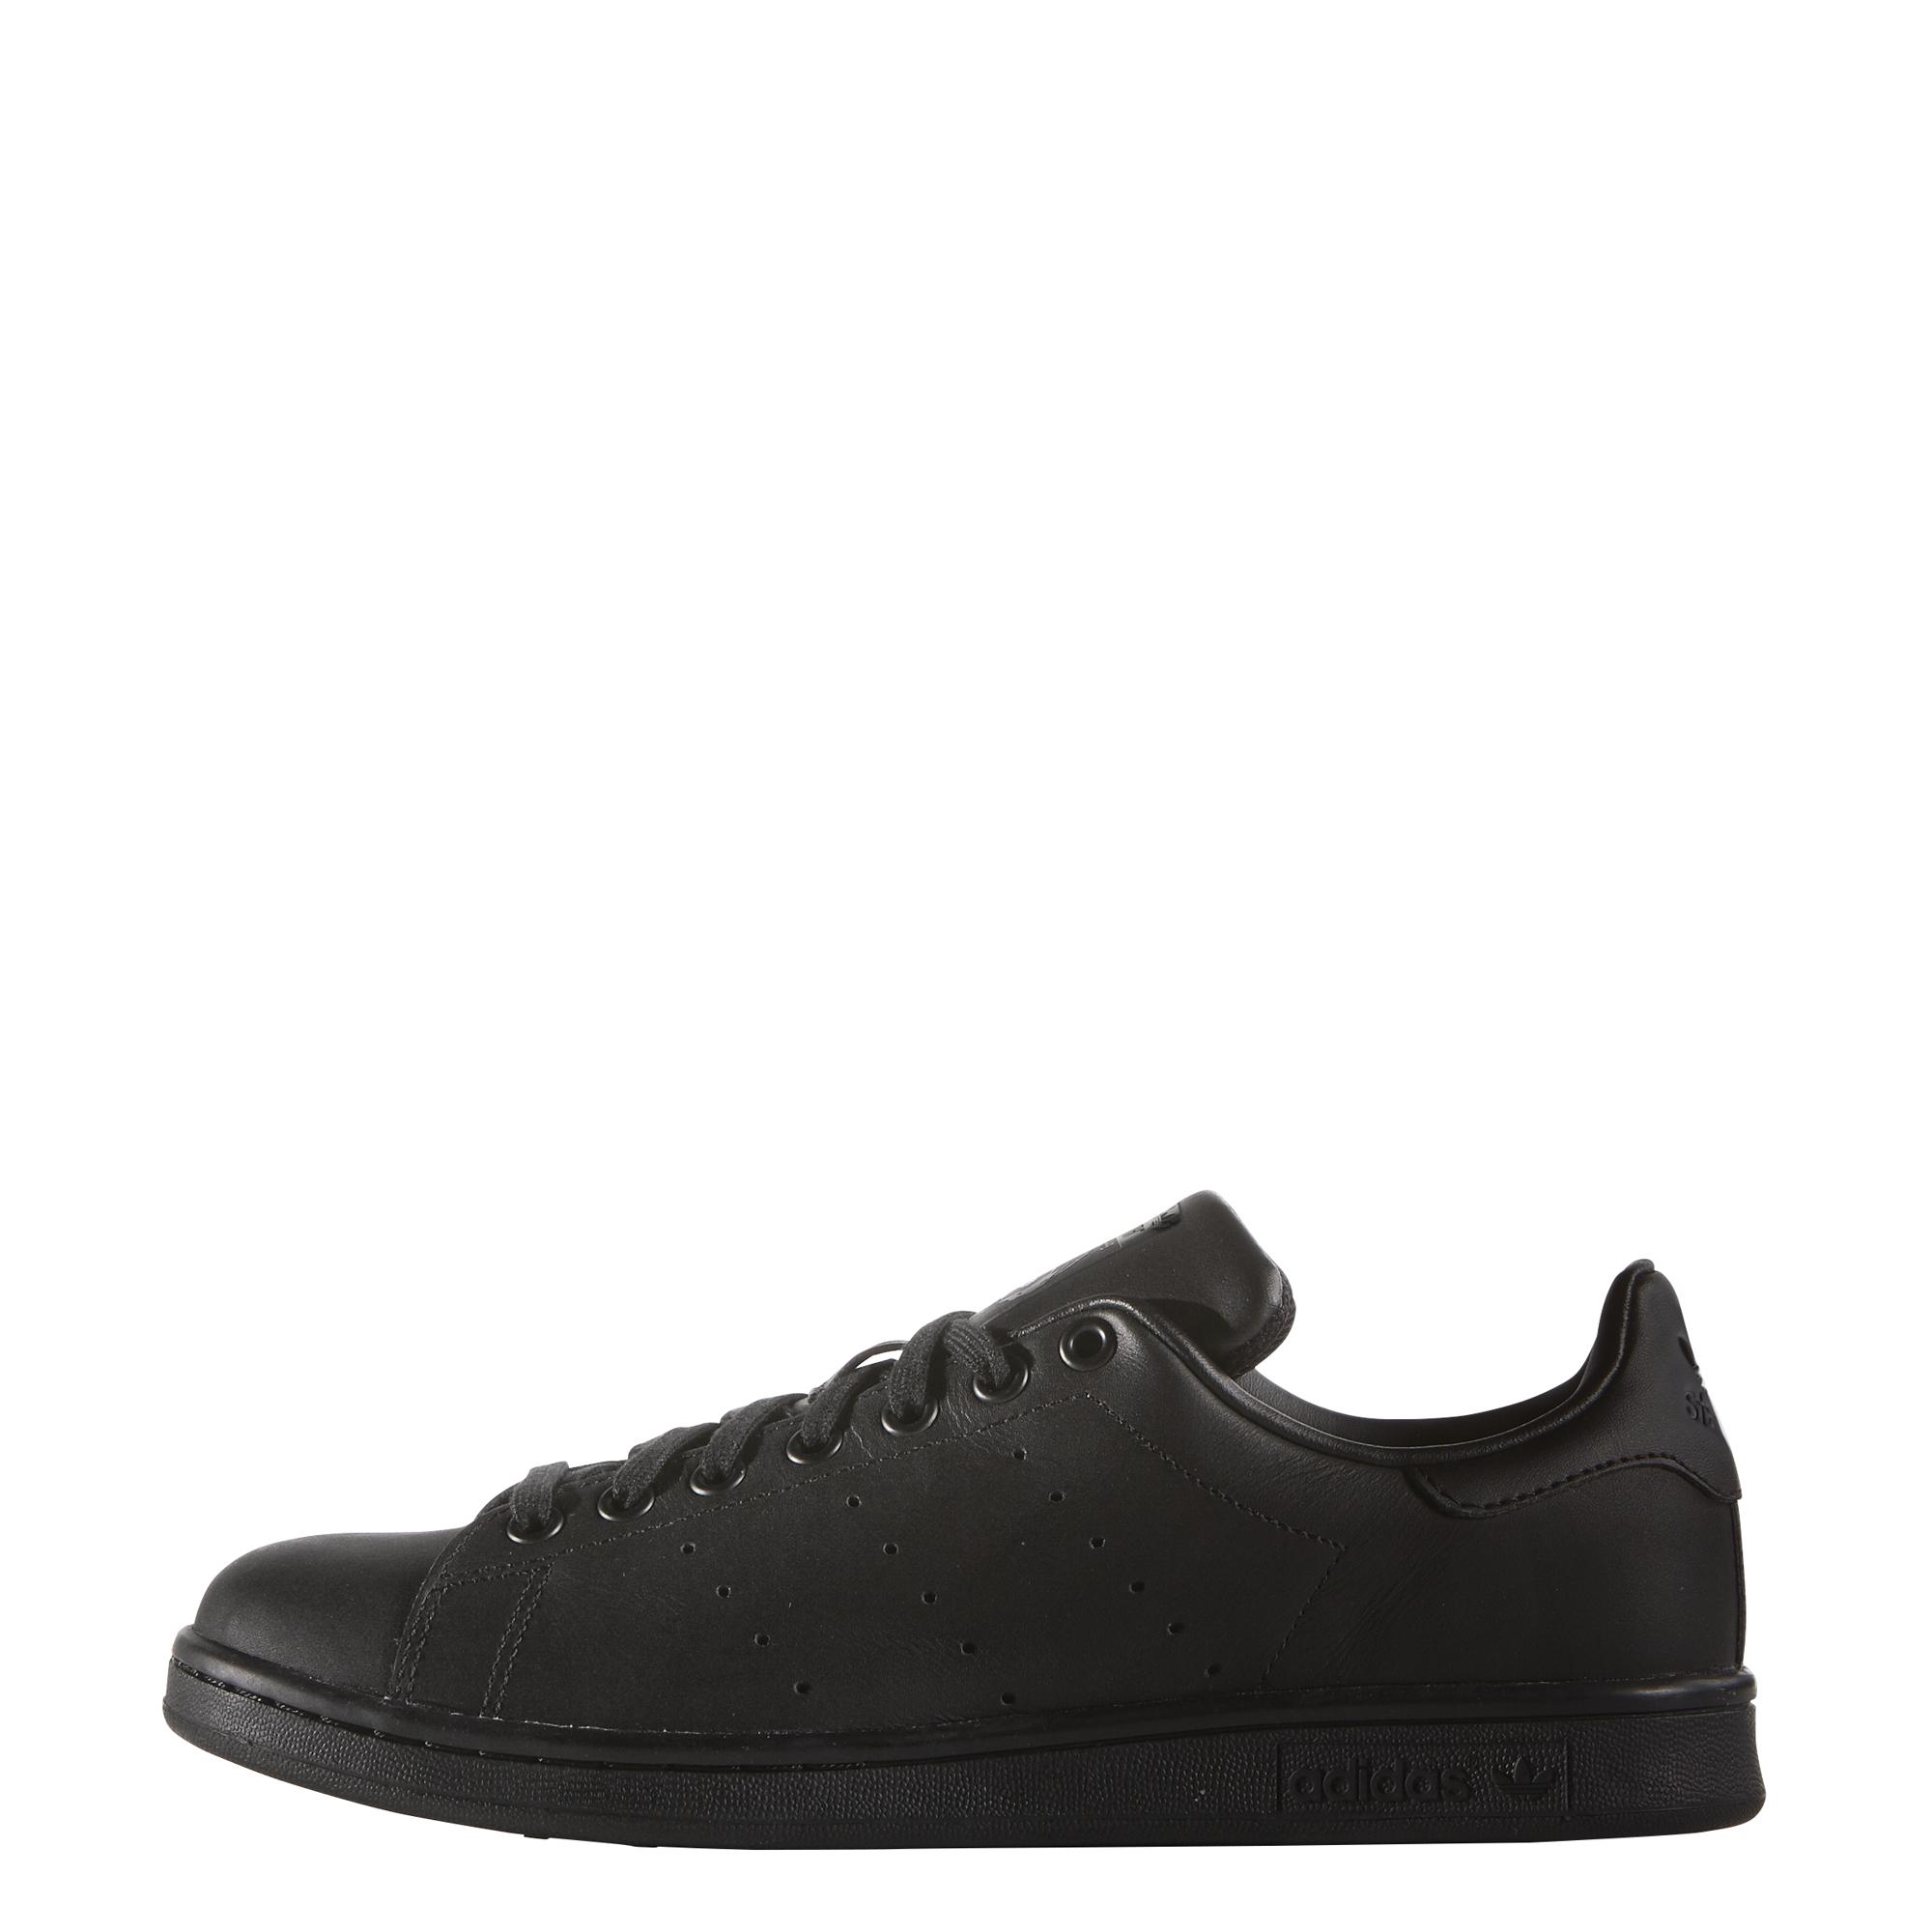 check out 77cc2 5d0a5 ... buty adidas Stan Smith Black M20327 ...